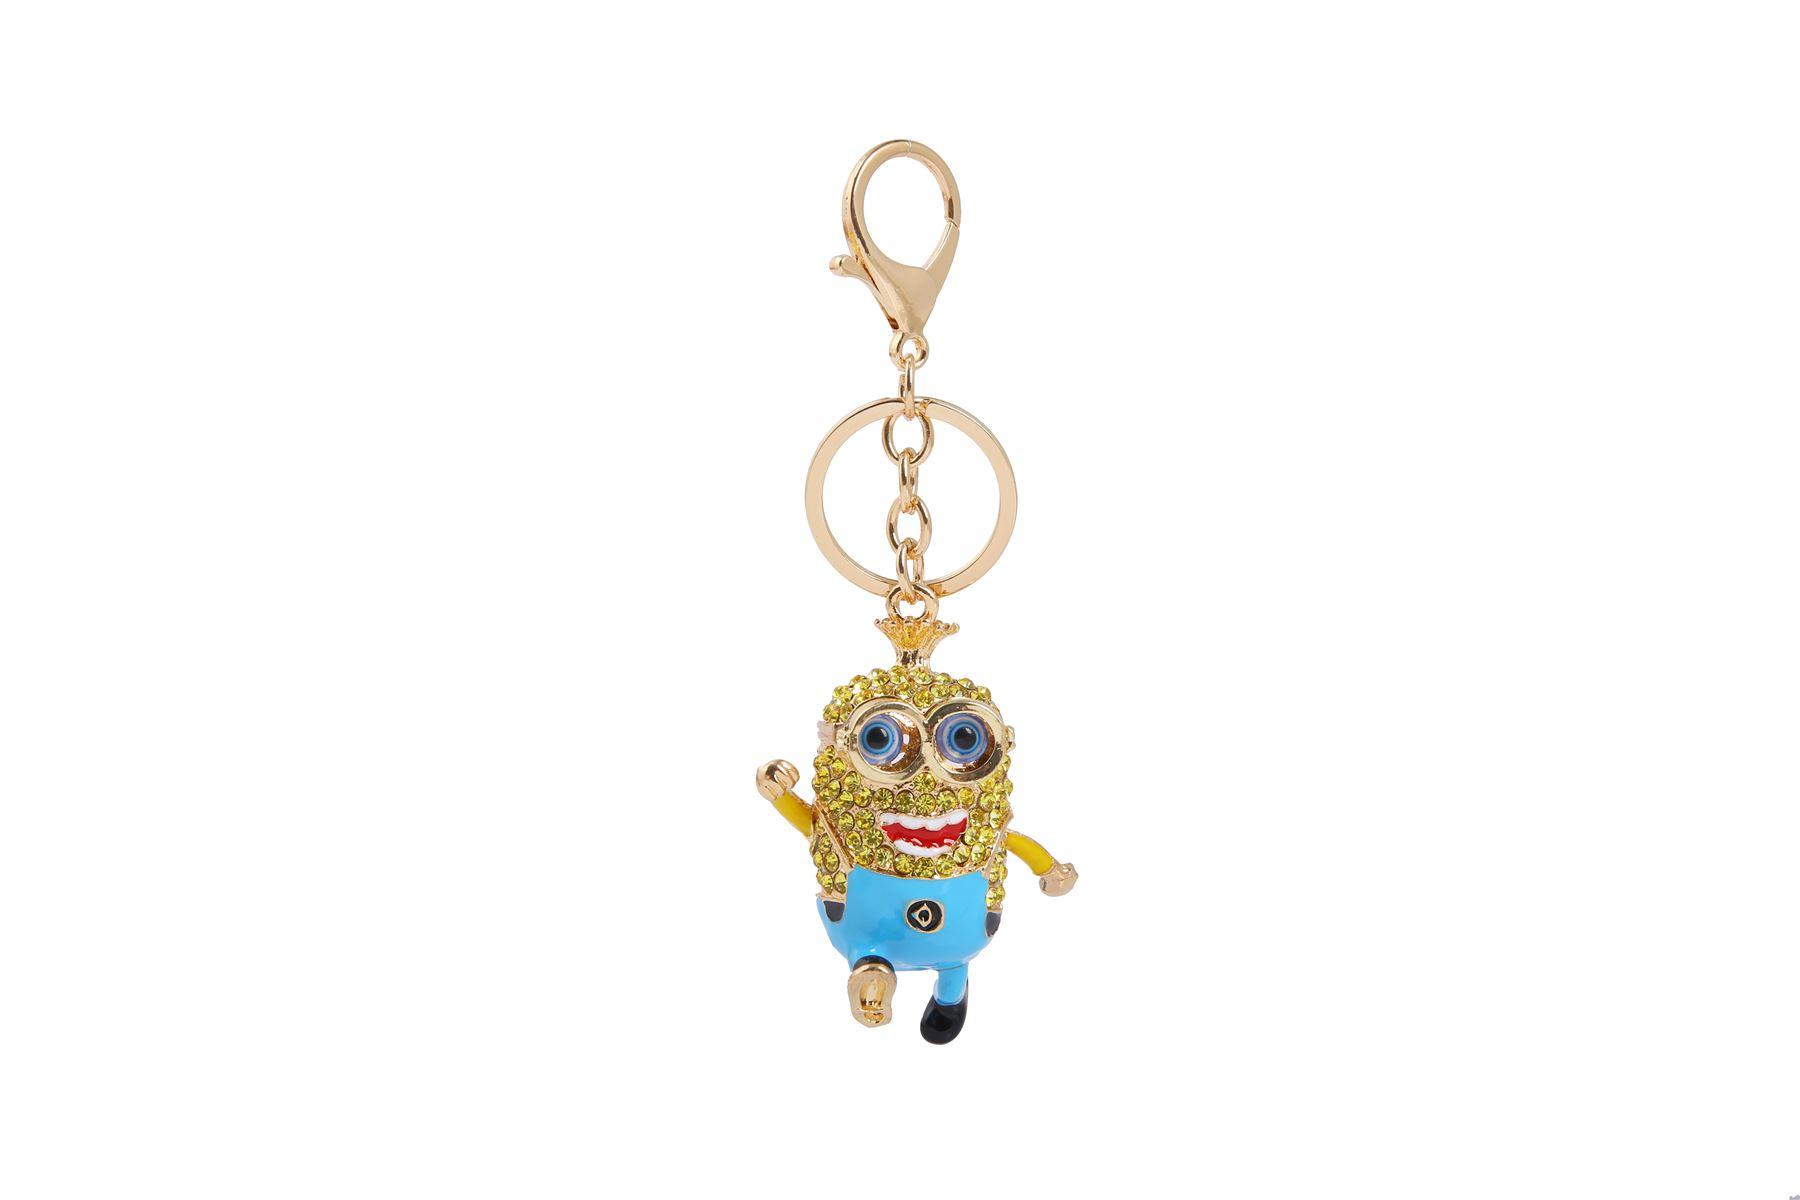 Key-Ring-Bag-Charm-Anime-Character-Rhinestone-Crystal-CZ-Keyring-Keychain-Gift thumbnail 25